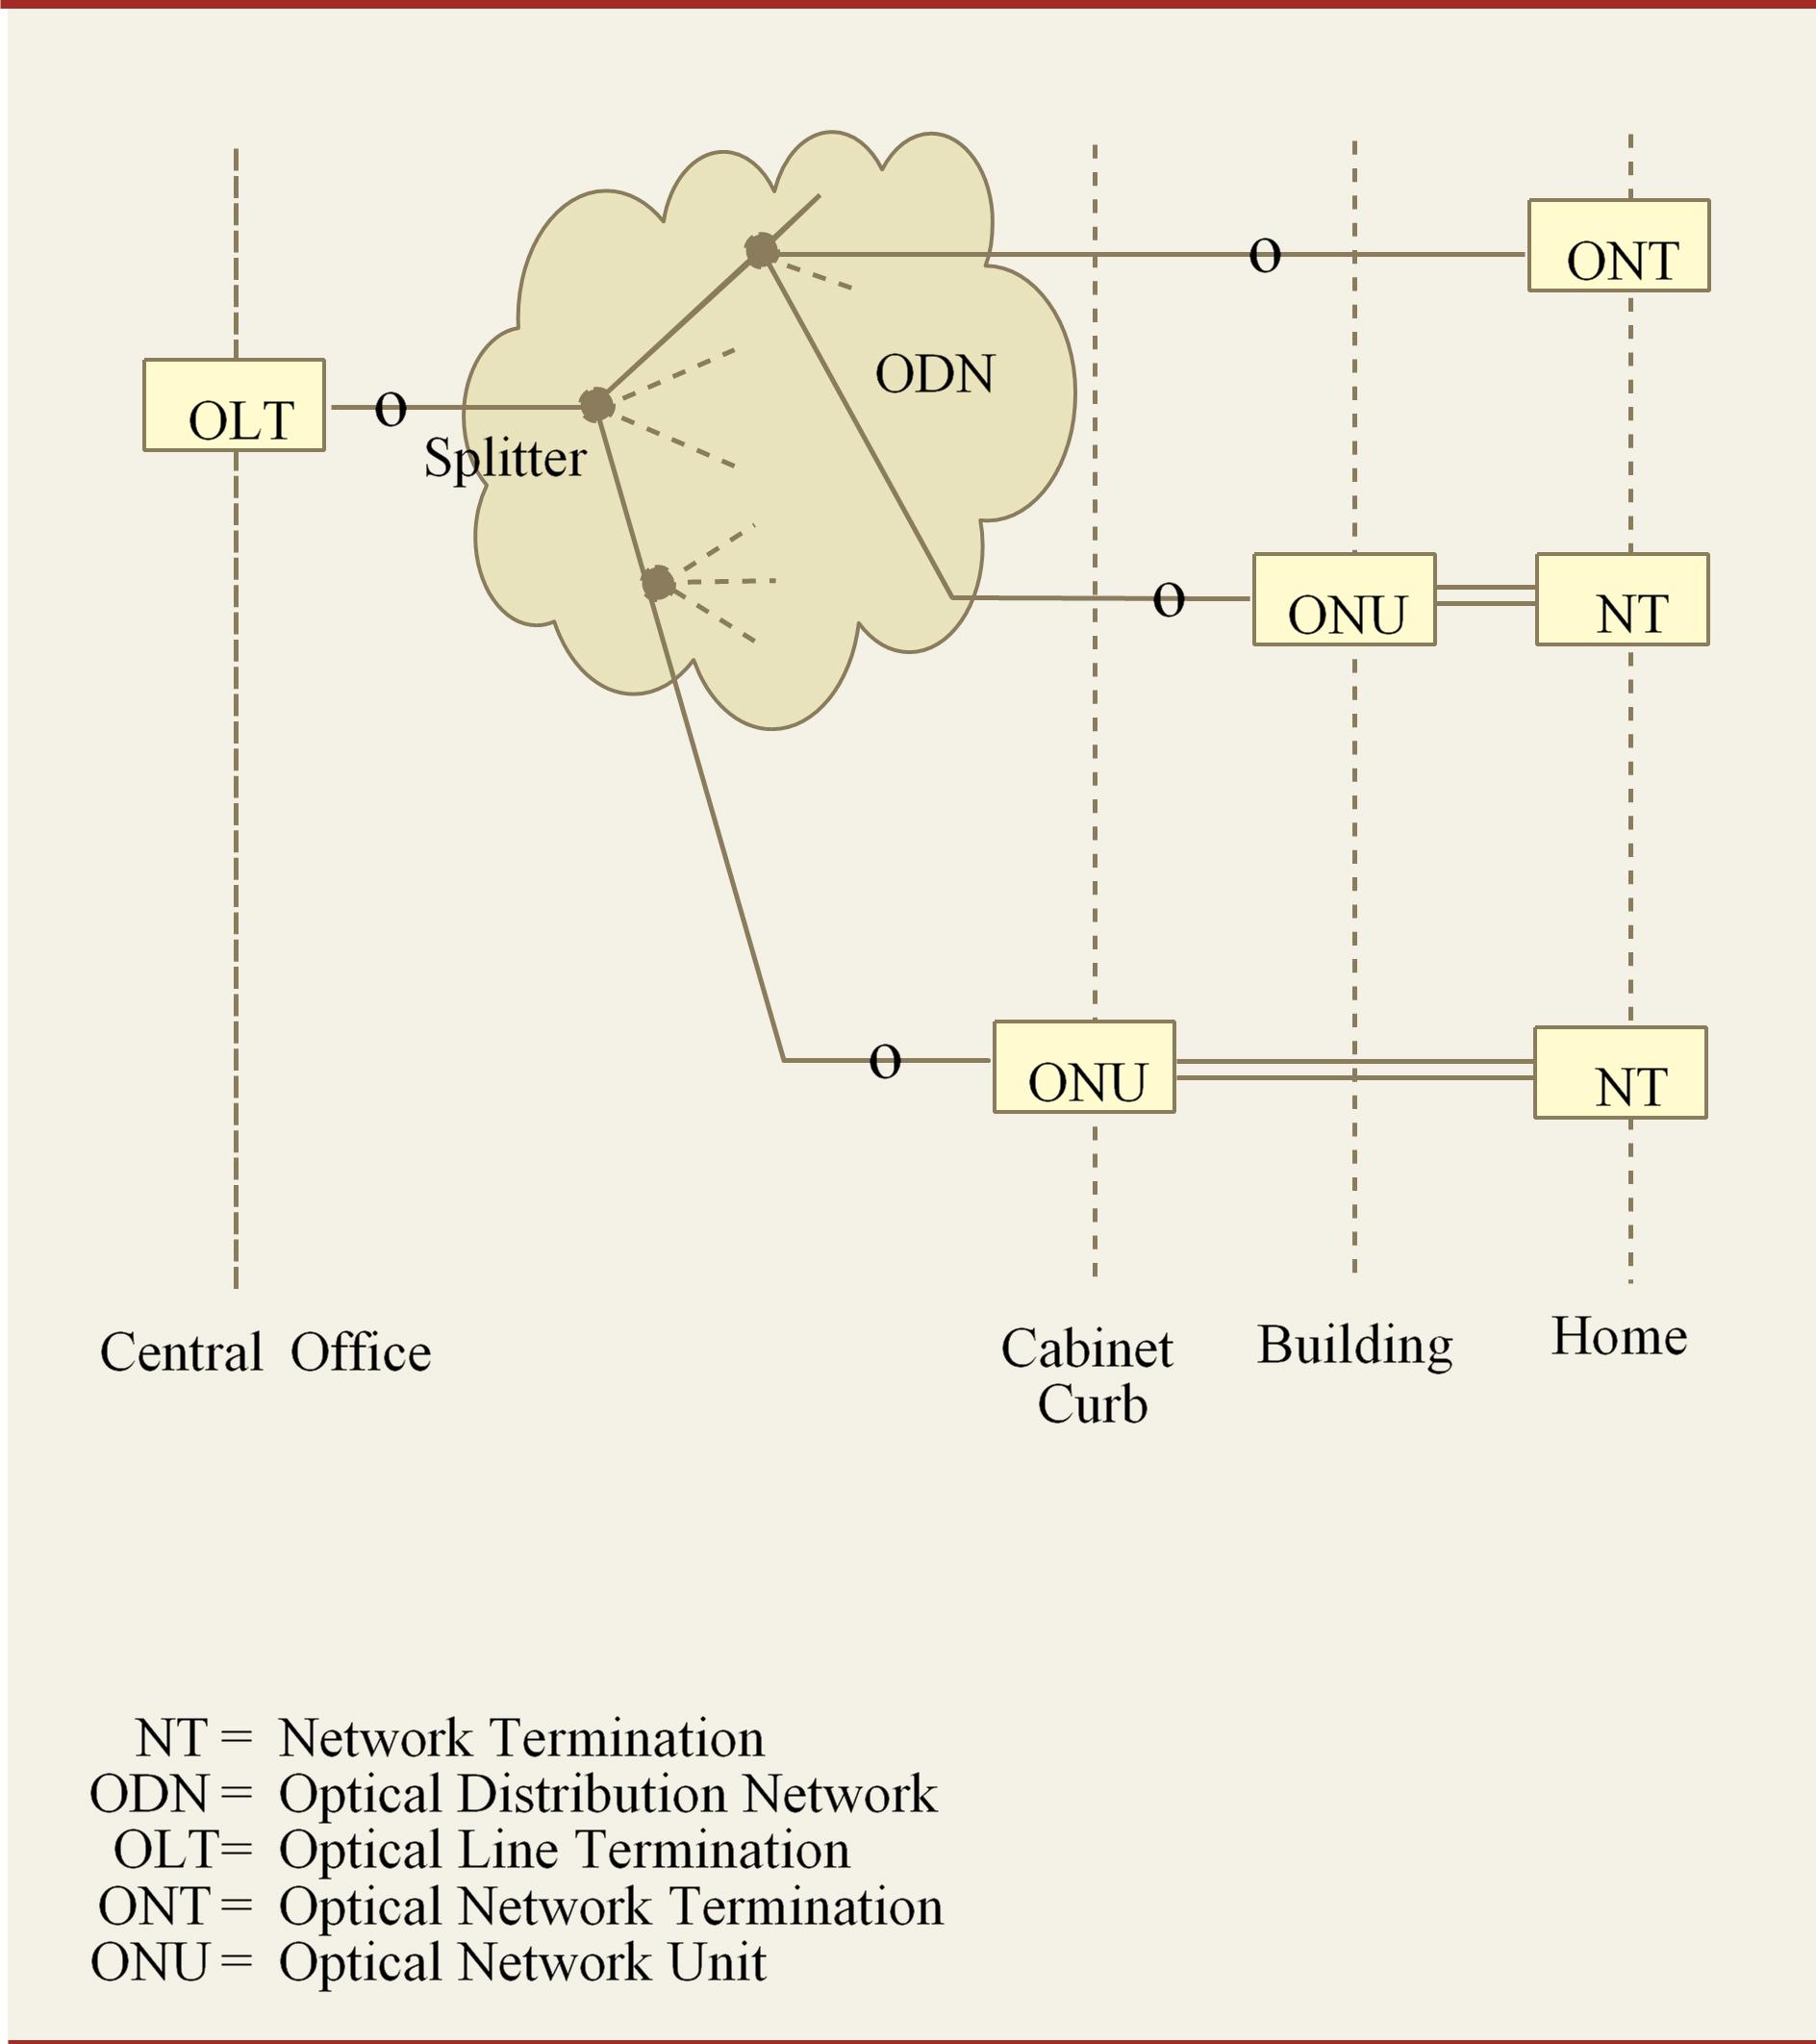 FIGURA 1› Struttura generale di una rete PON